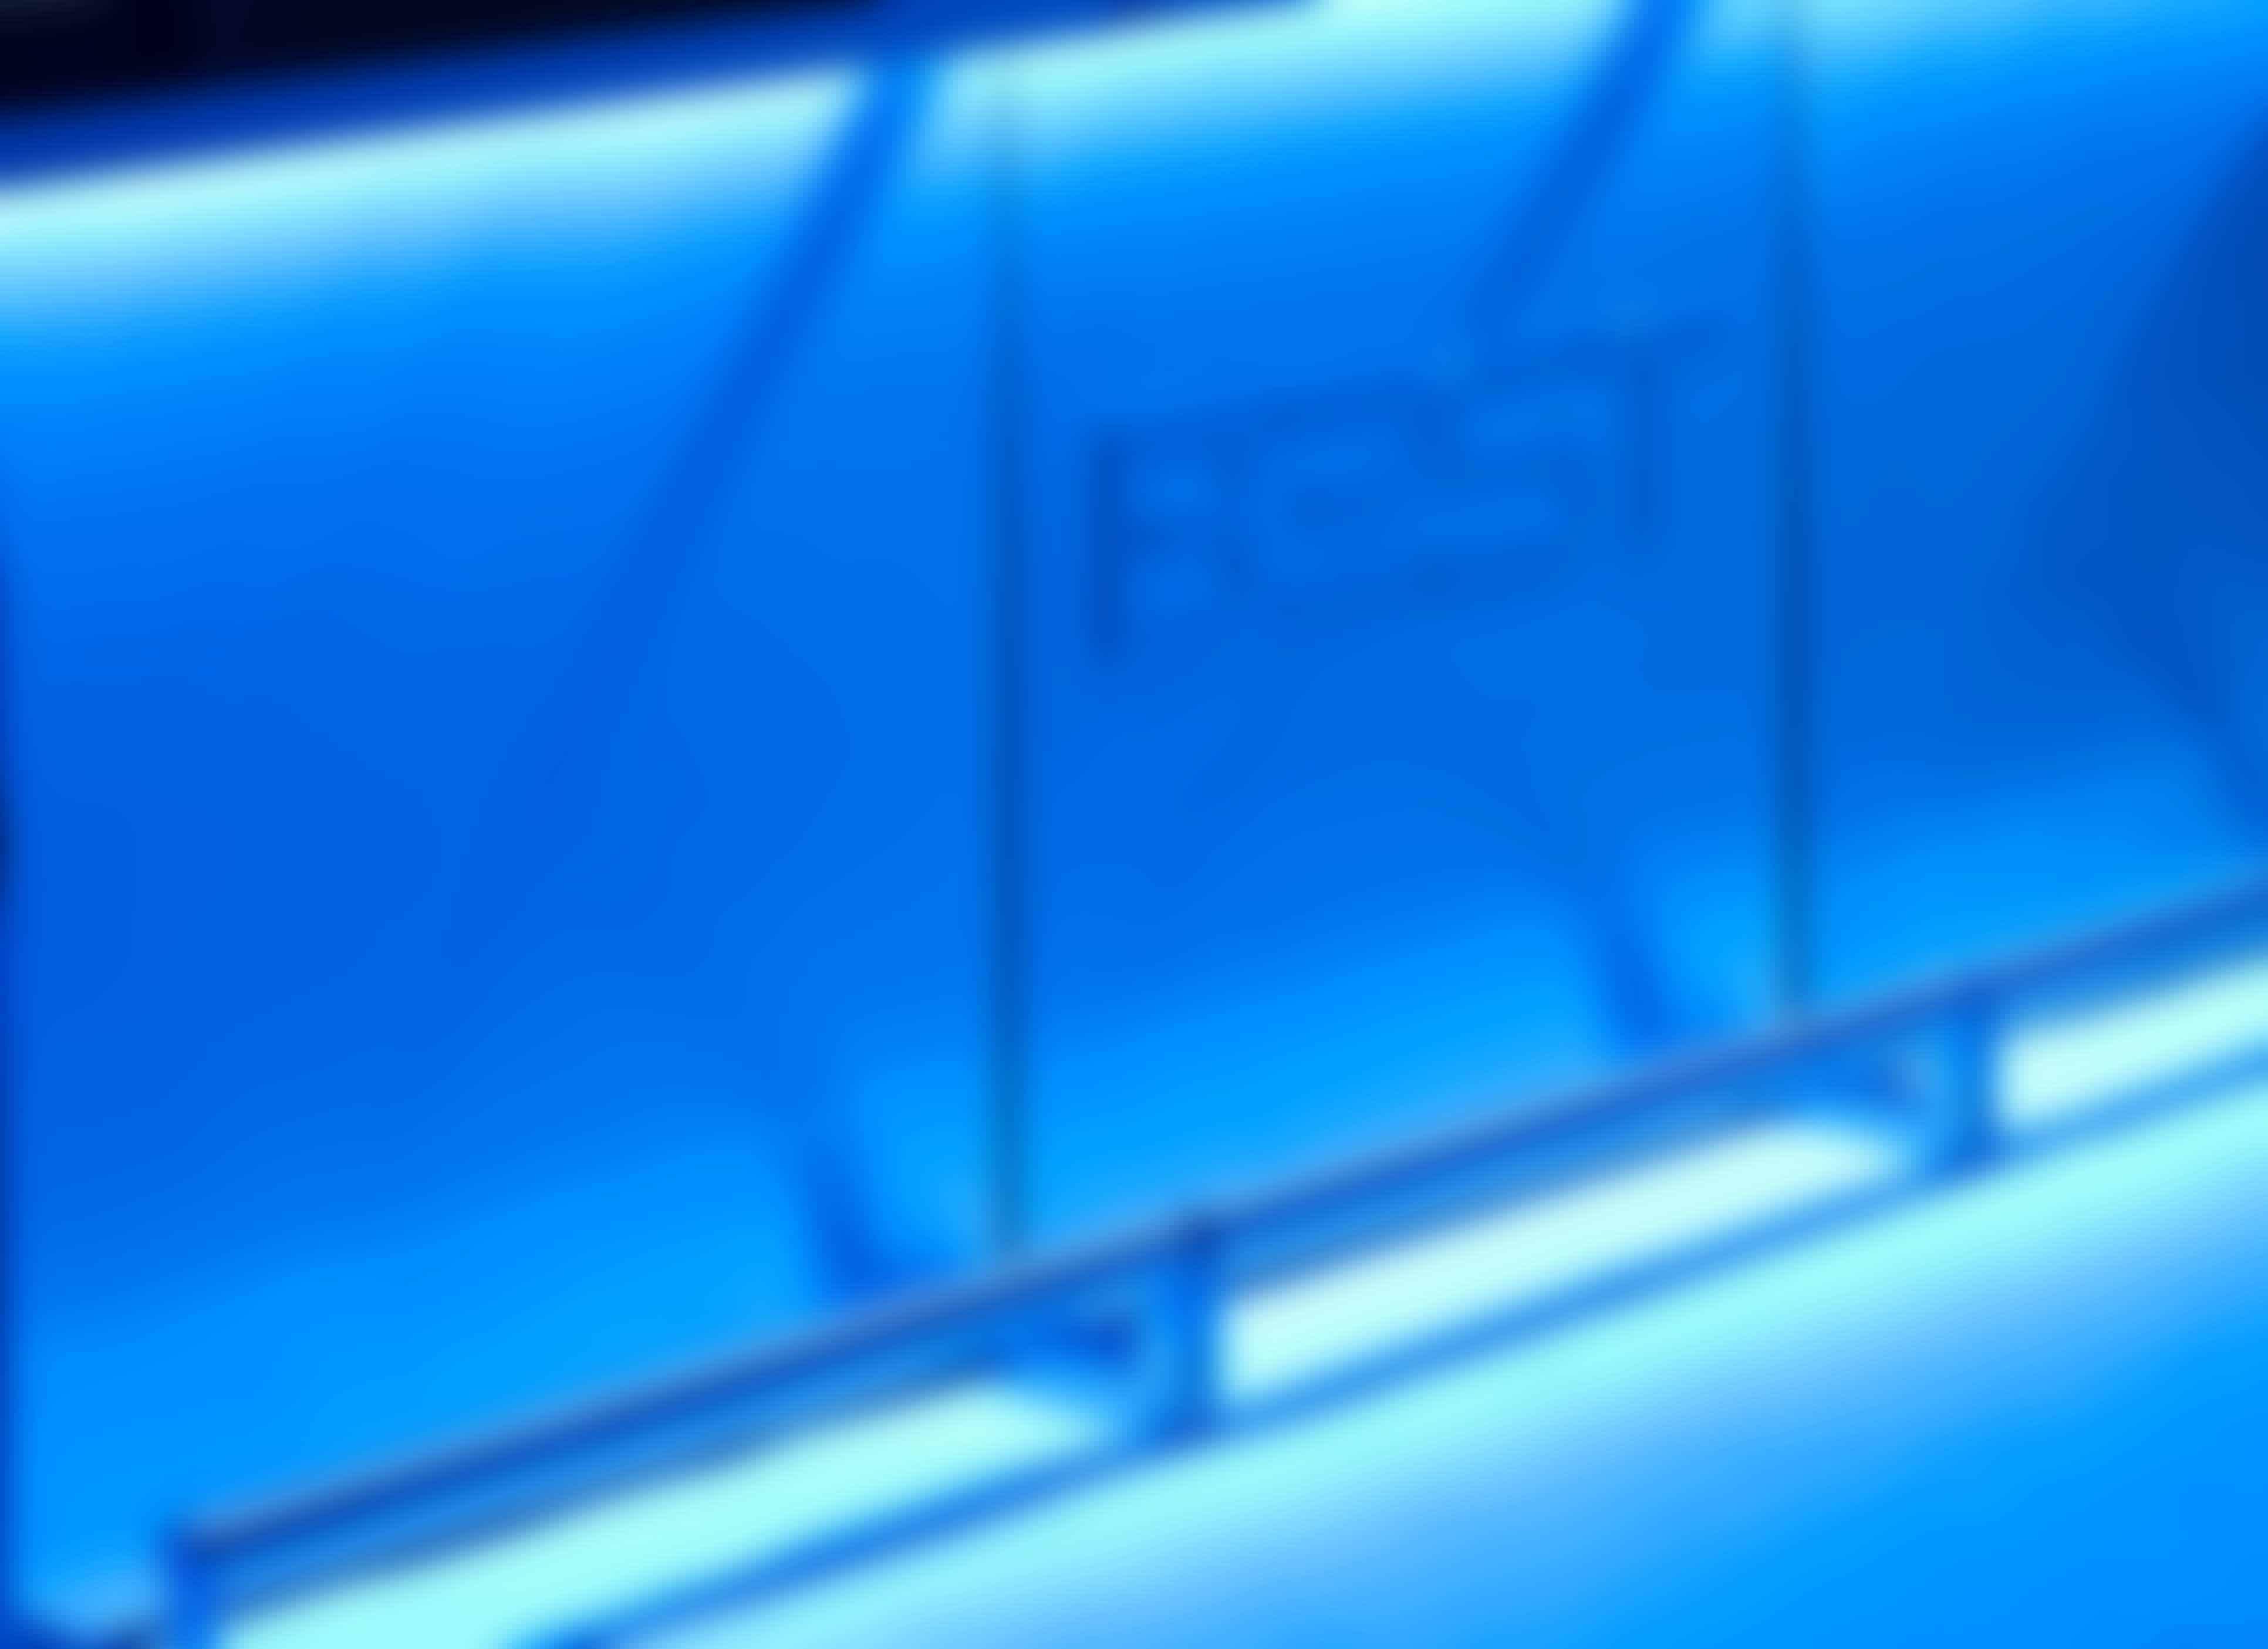 BEST-3-Bars-Blue-Light-Intro-blurry